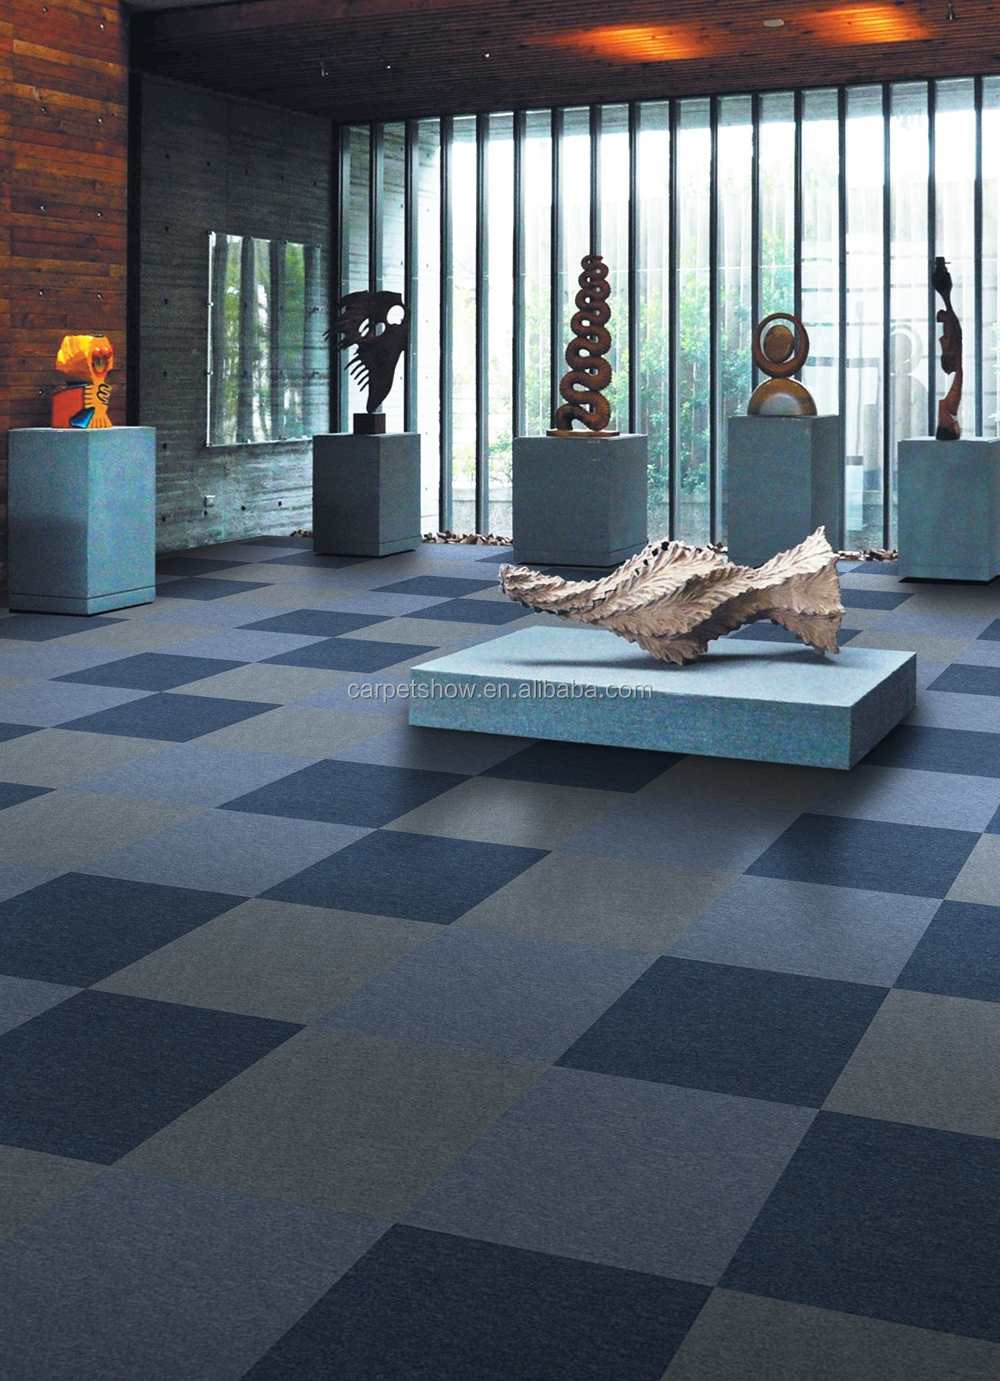 Adhesive Carpet 12x12 Self Tiles Rug